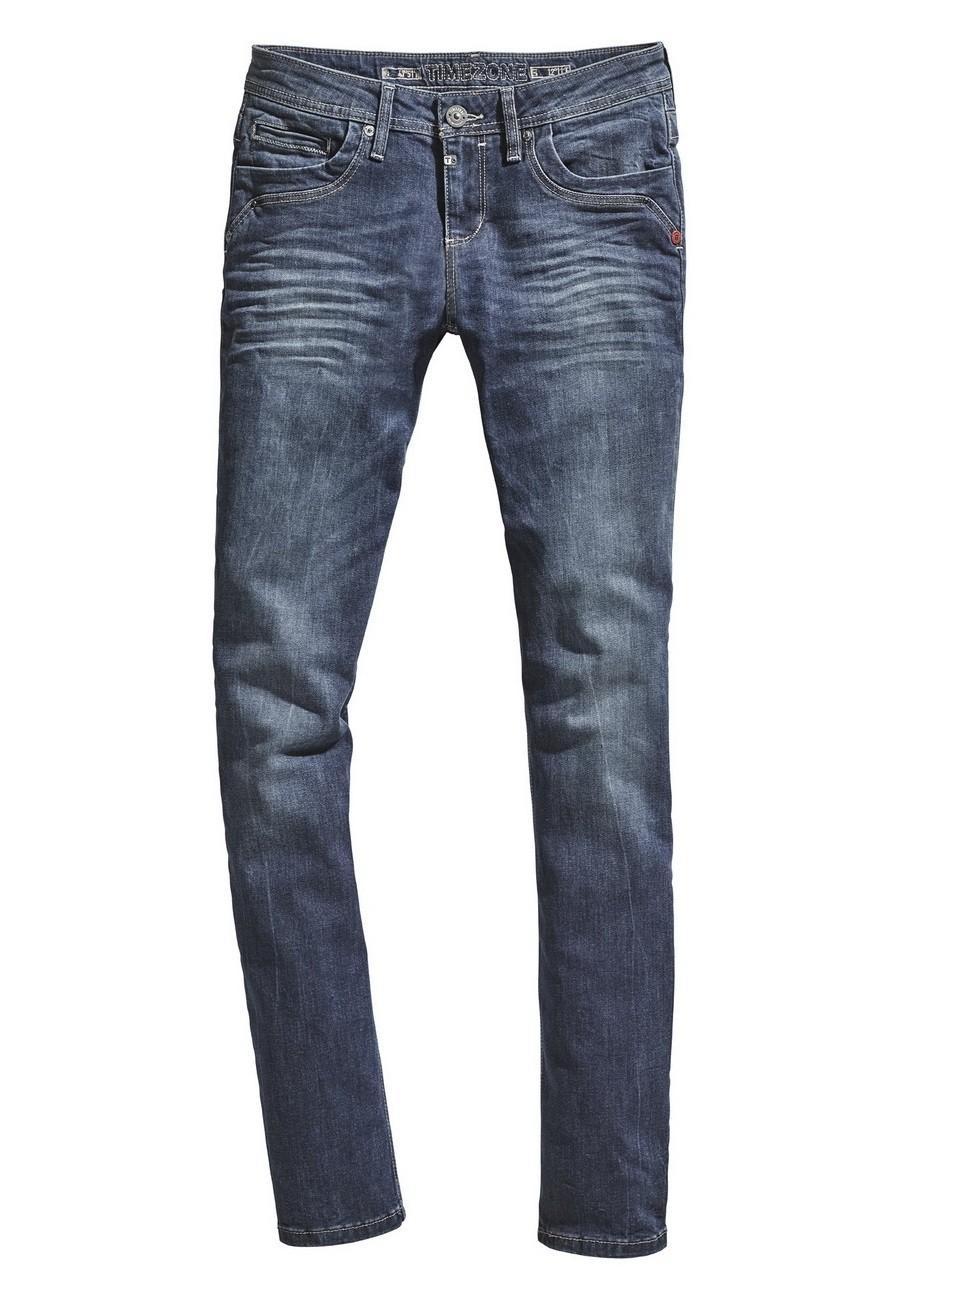 Timezone Damen Jeans TahilaTZ - Slim Fit - Blau - Surfer Wash